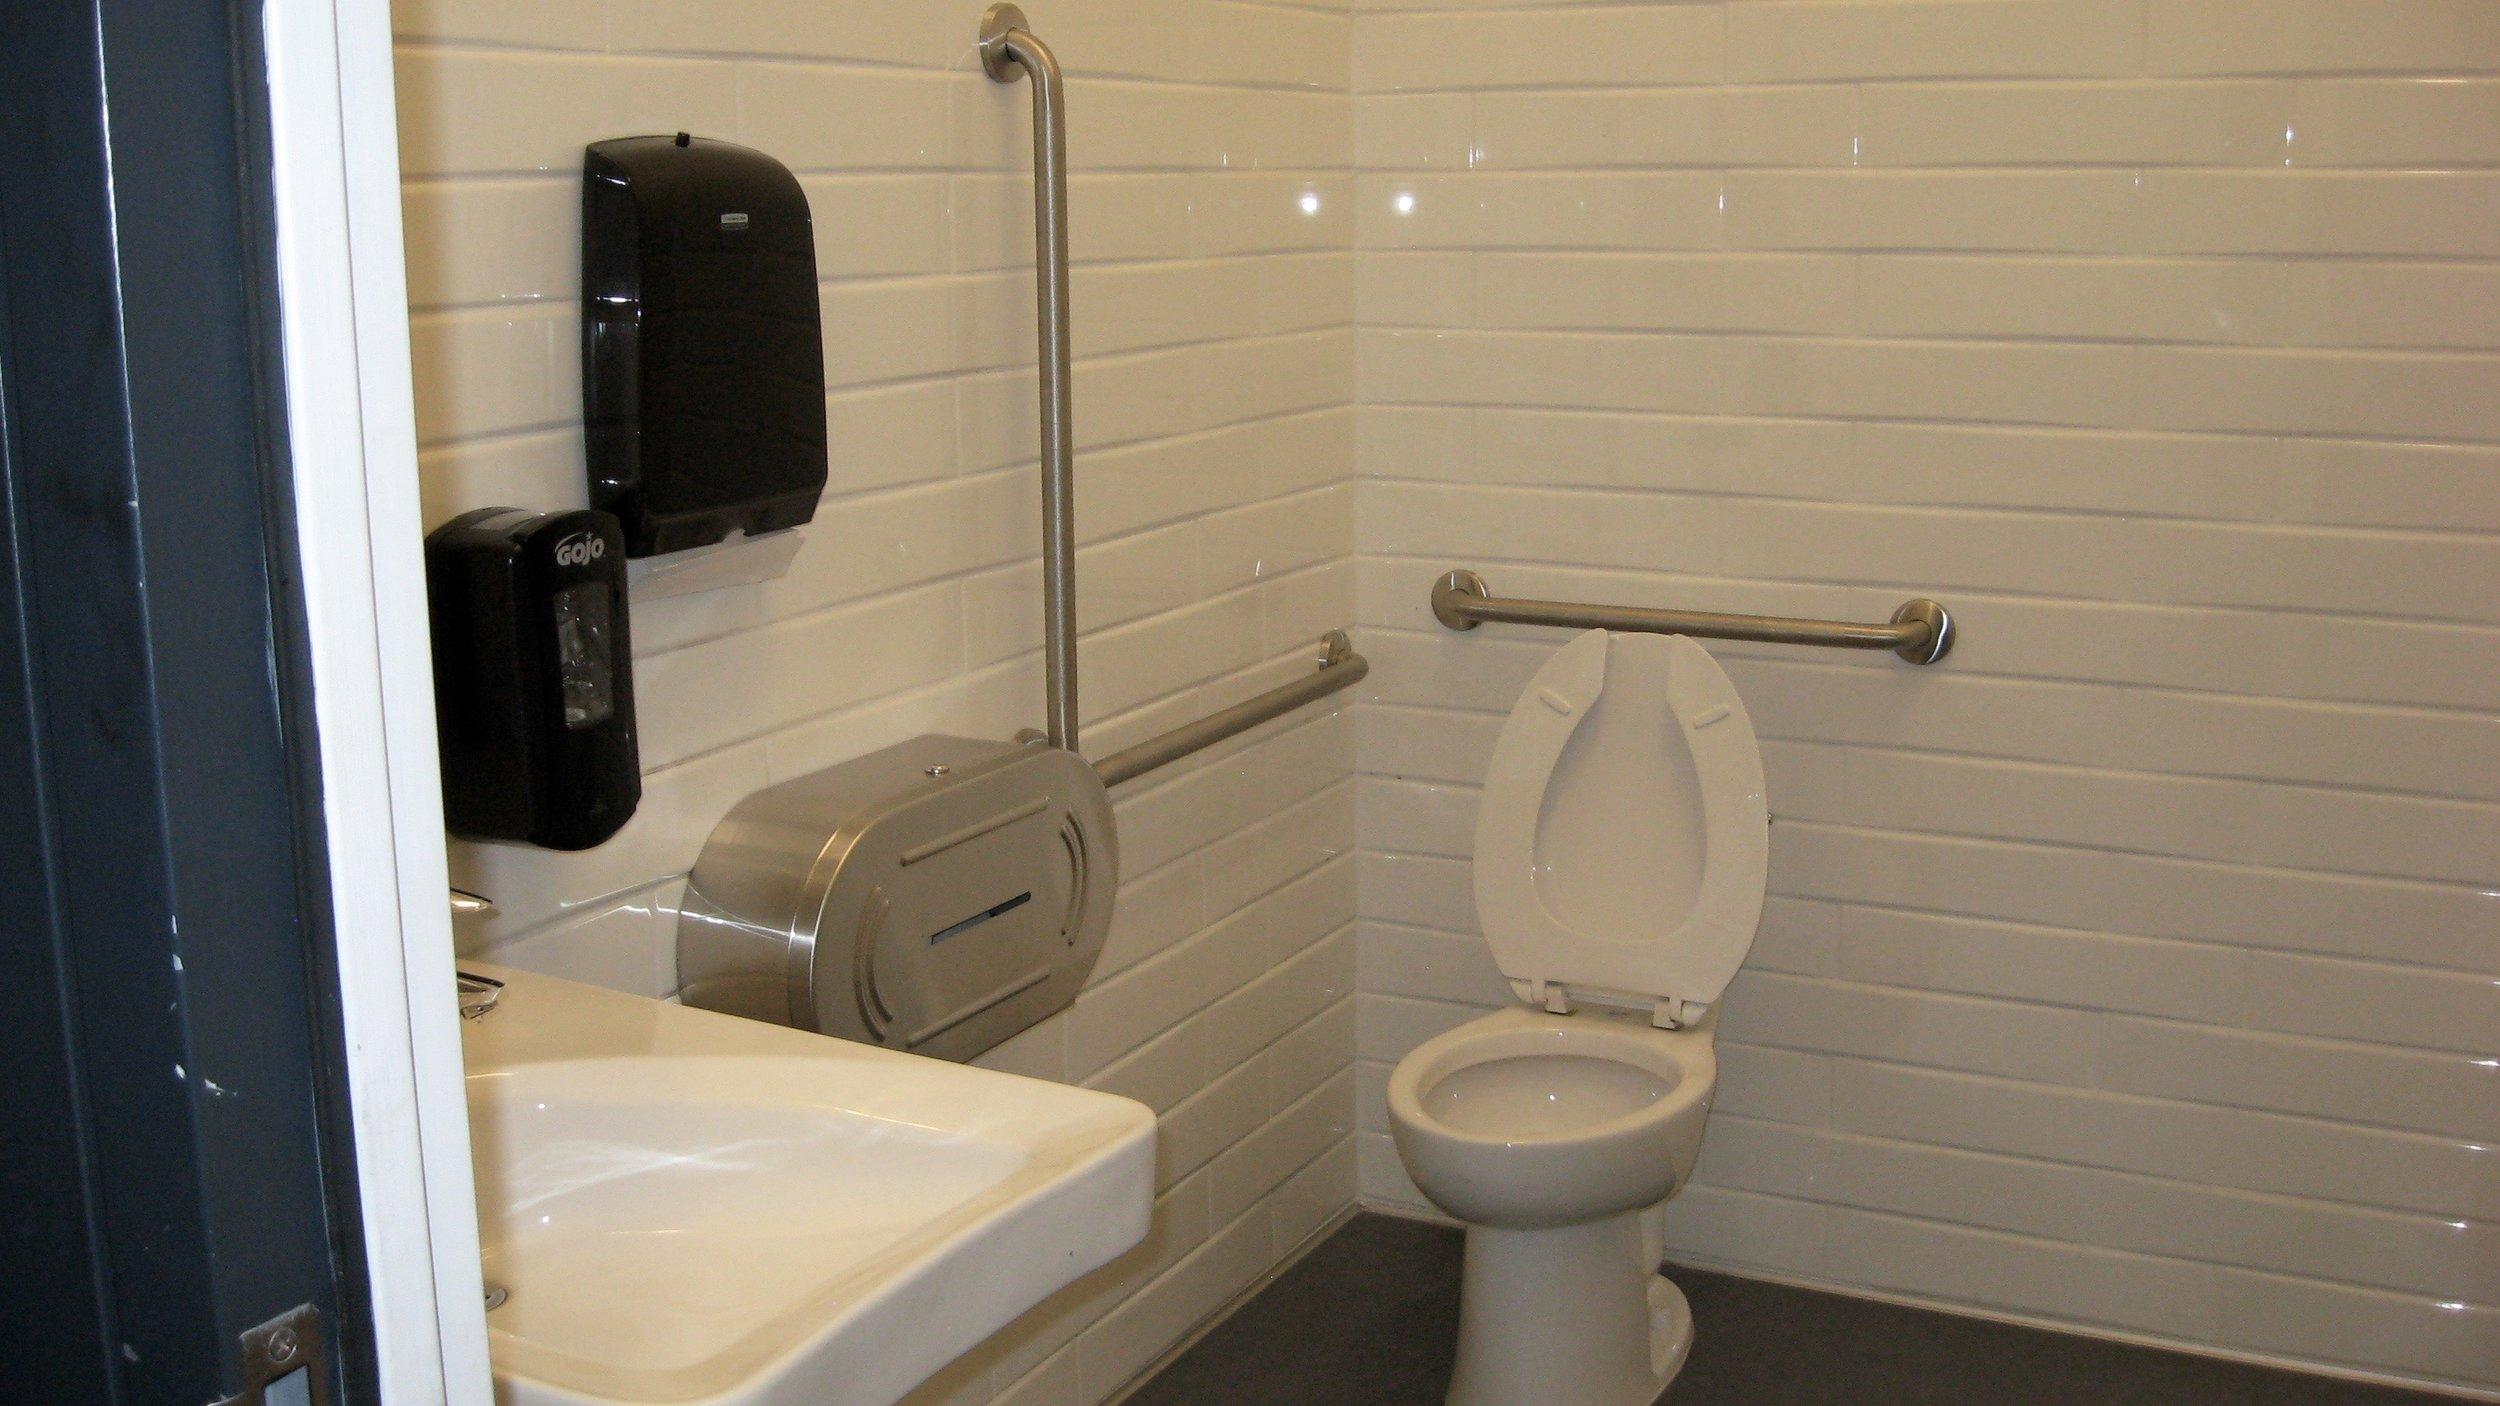 single occupancy restroom